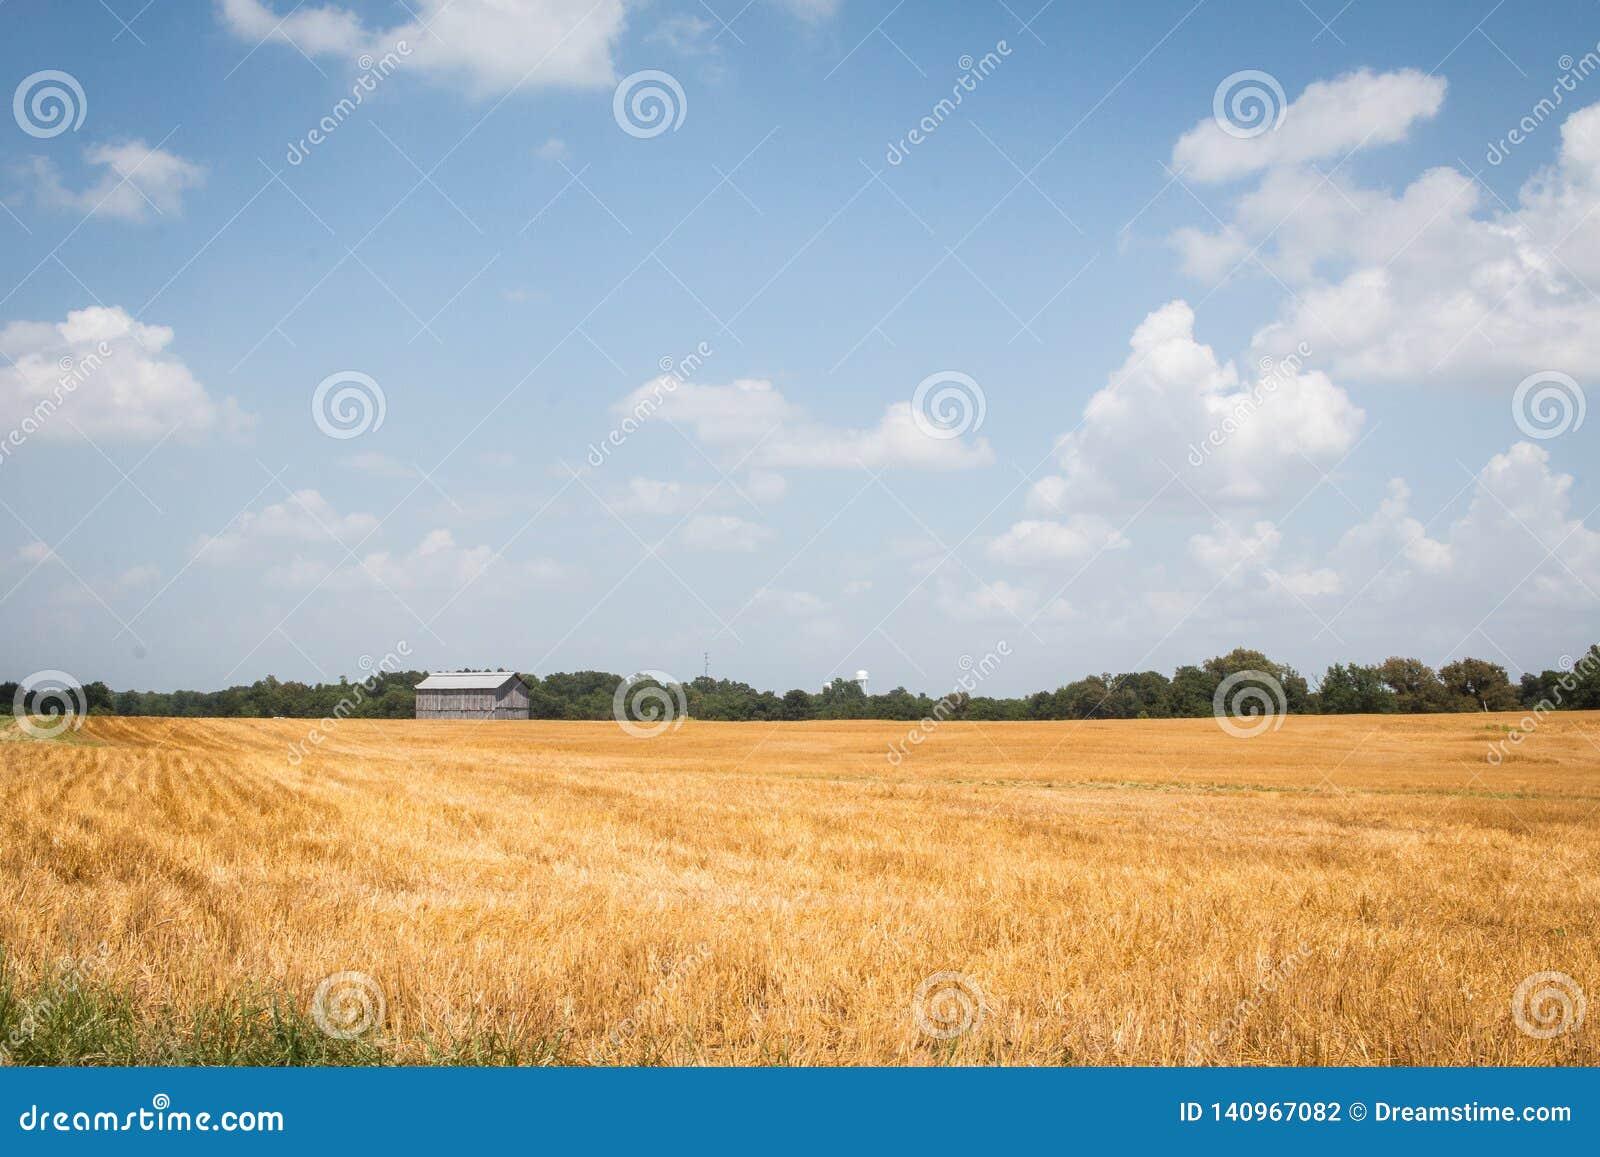 Field of Wheat in the Heartland